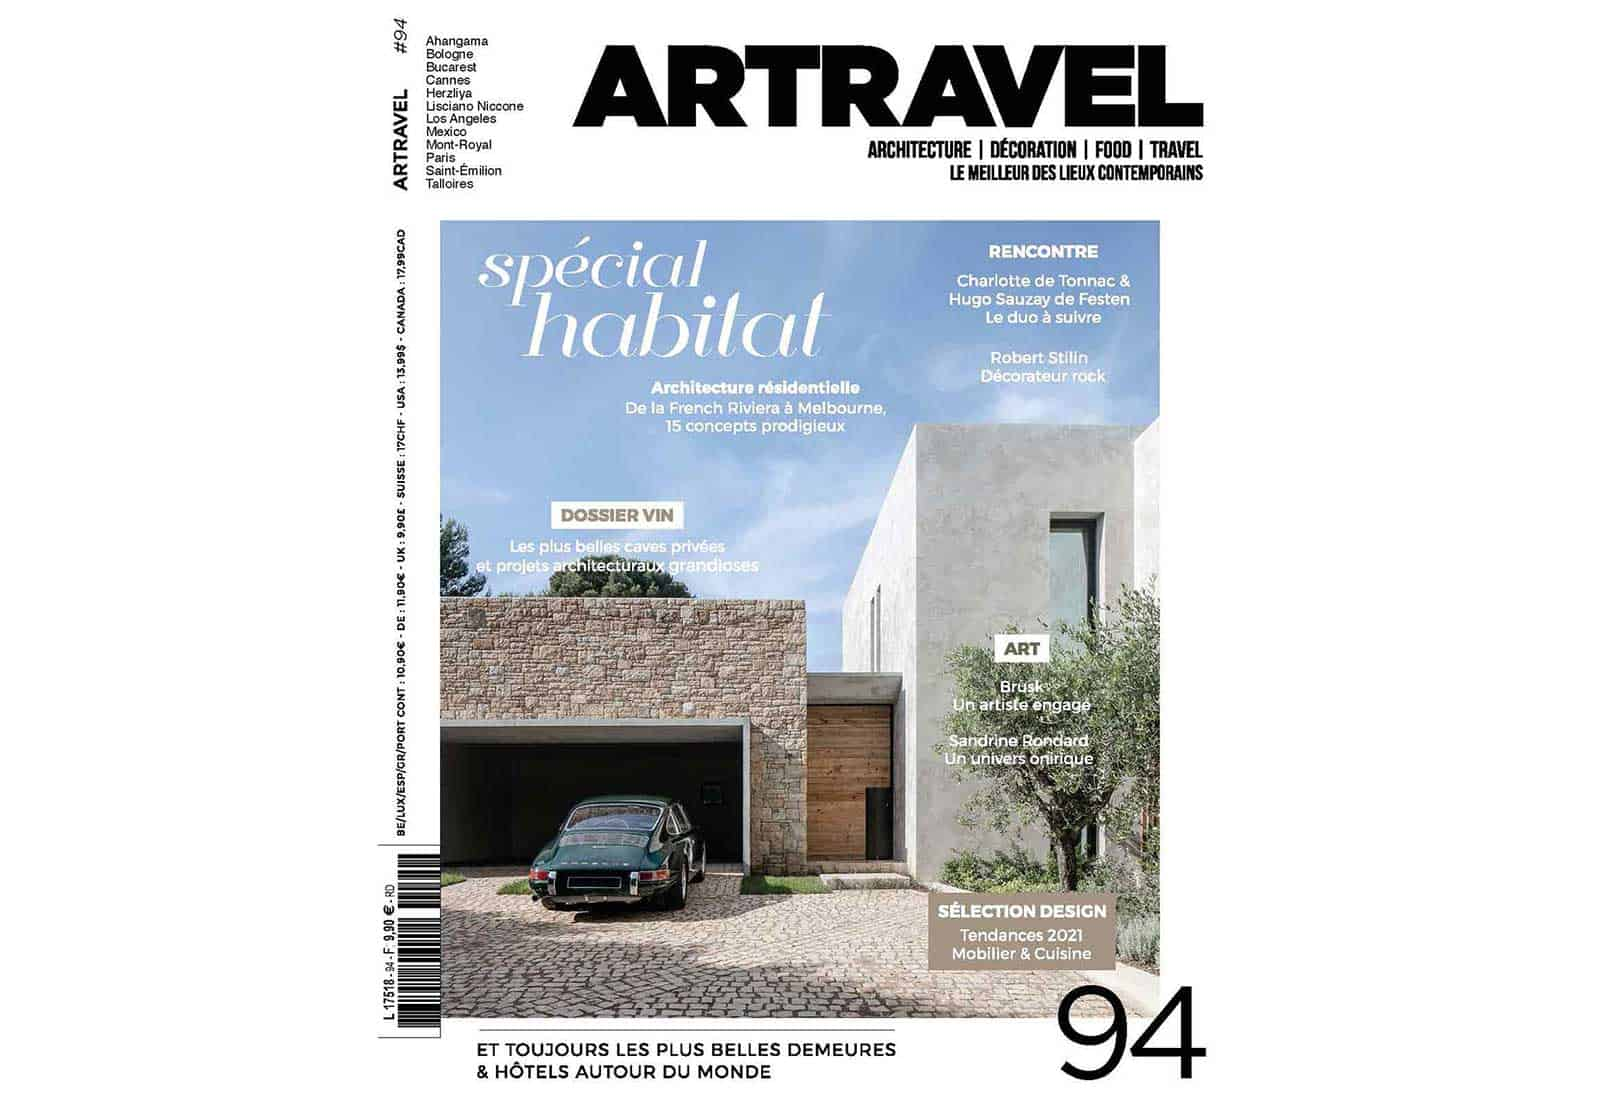 Artravel article archidomo villa akila, Annecy Talloires - n94 couverture